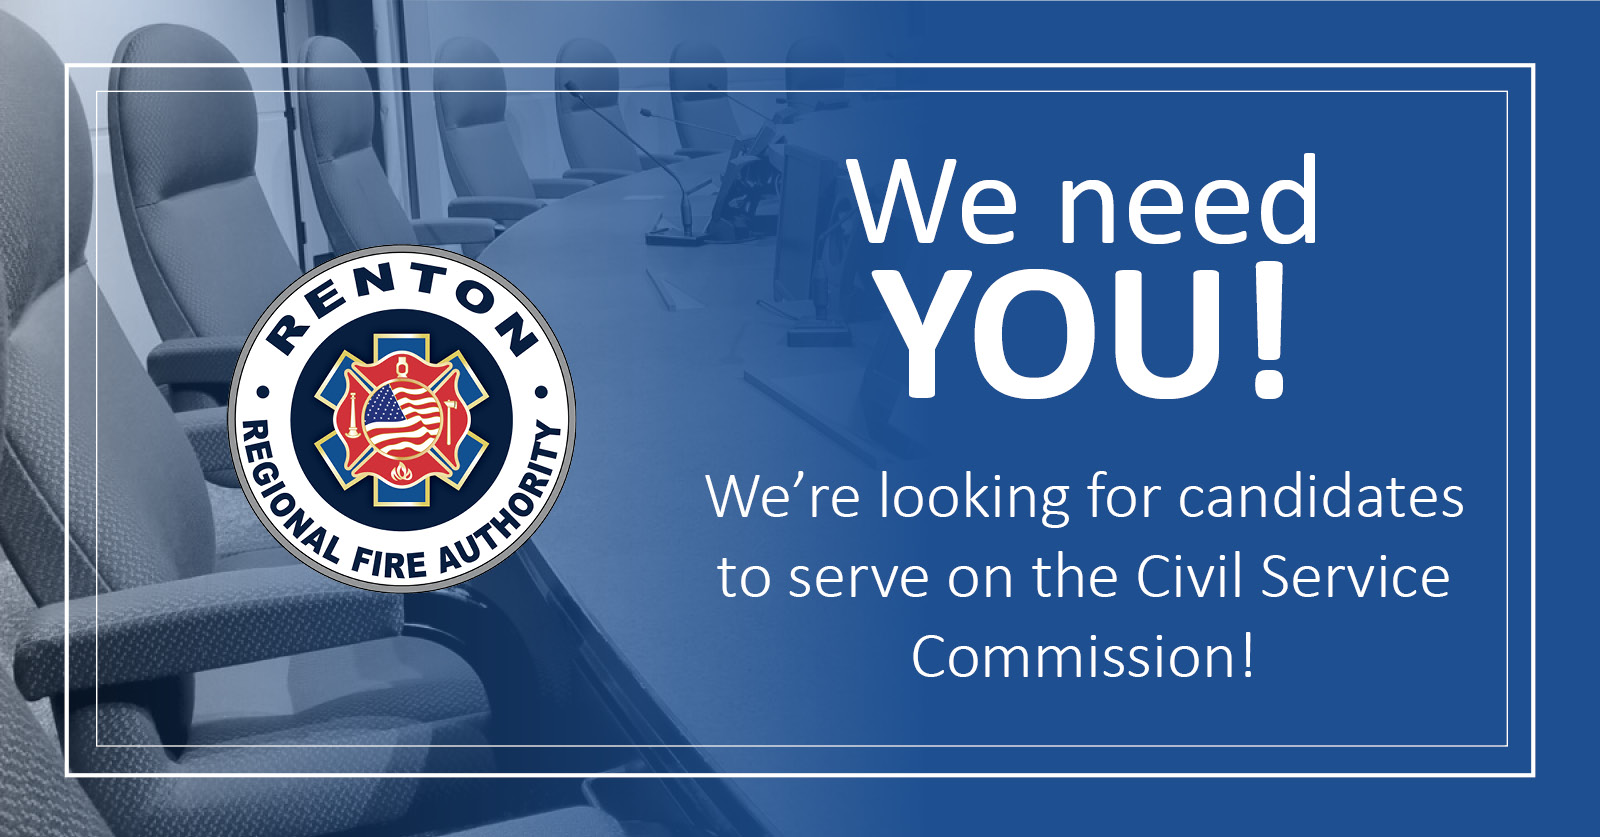 Renton RFA Seeks Candidates for Civil Service Commission